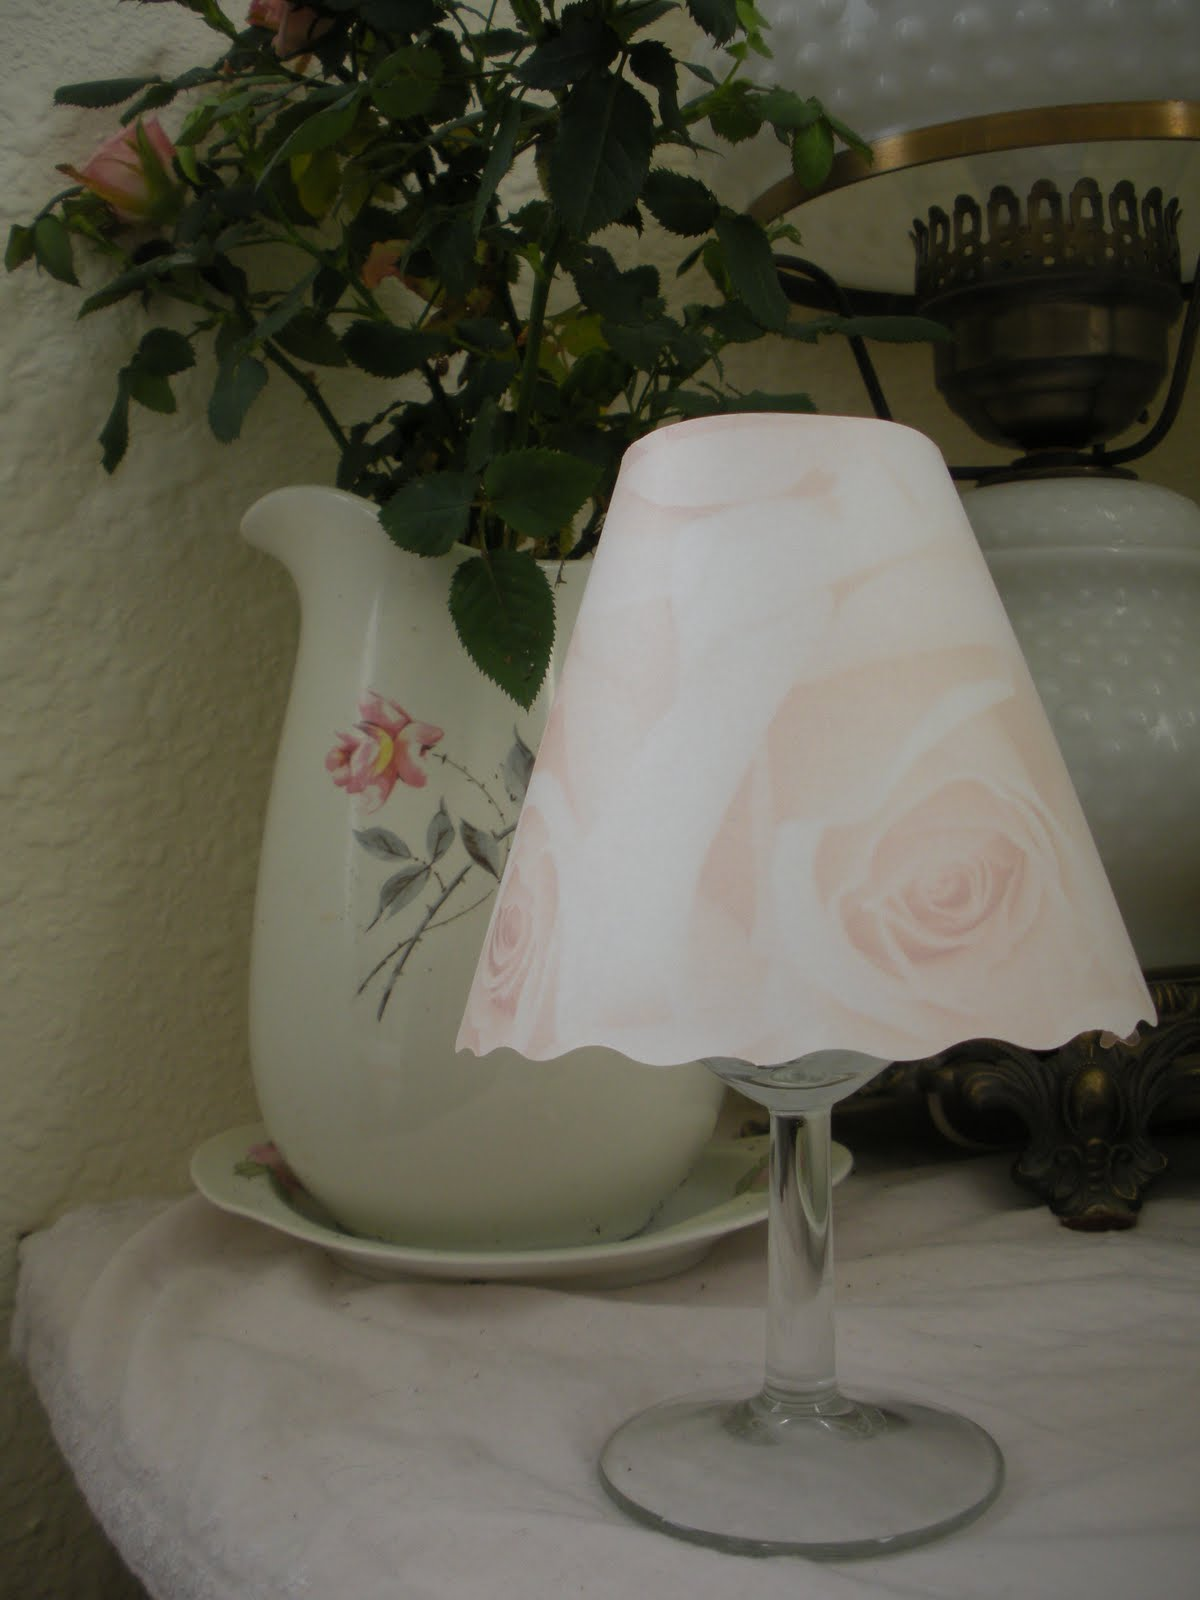 http://3.bp.blogspot.com/-y2VqHXTqfQE/TdW1LYea6lI/AAAAAAAAHhI/x2XKlLYsVaI/s1600/pink+rose+wine+glass+shade.JPG